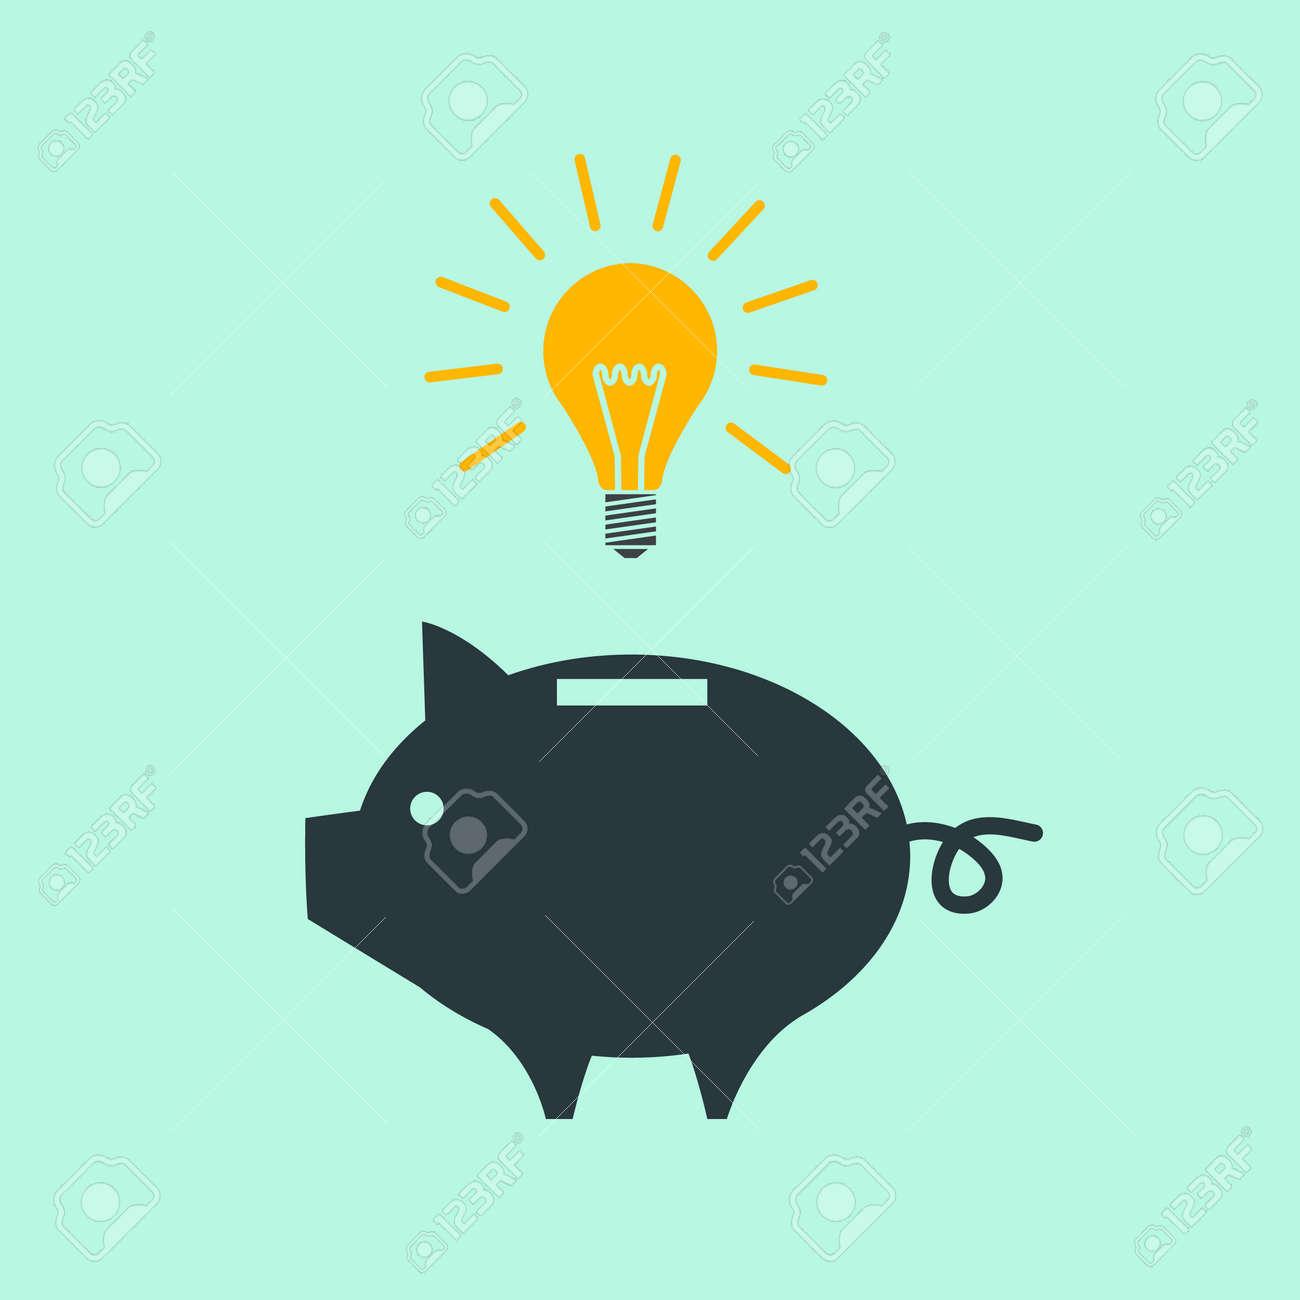 Vektor Piggy Spardose Neue Idee Mit Glühlampe Symbol | Moderne ...